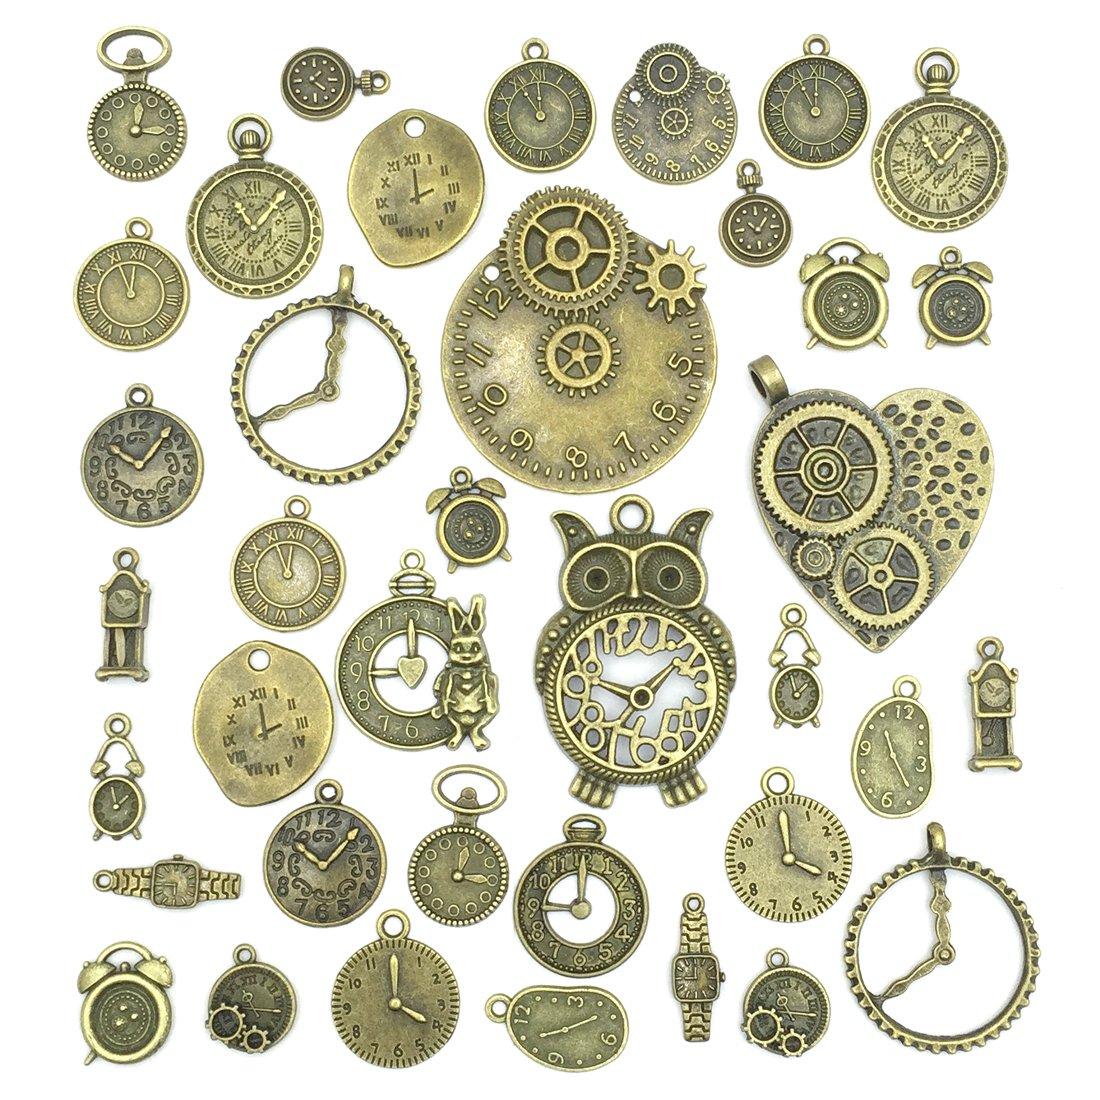 Amazon.com: LolliBeads 120 Gram Antiqued Bronze Metal